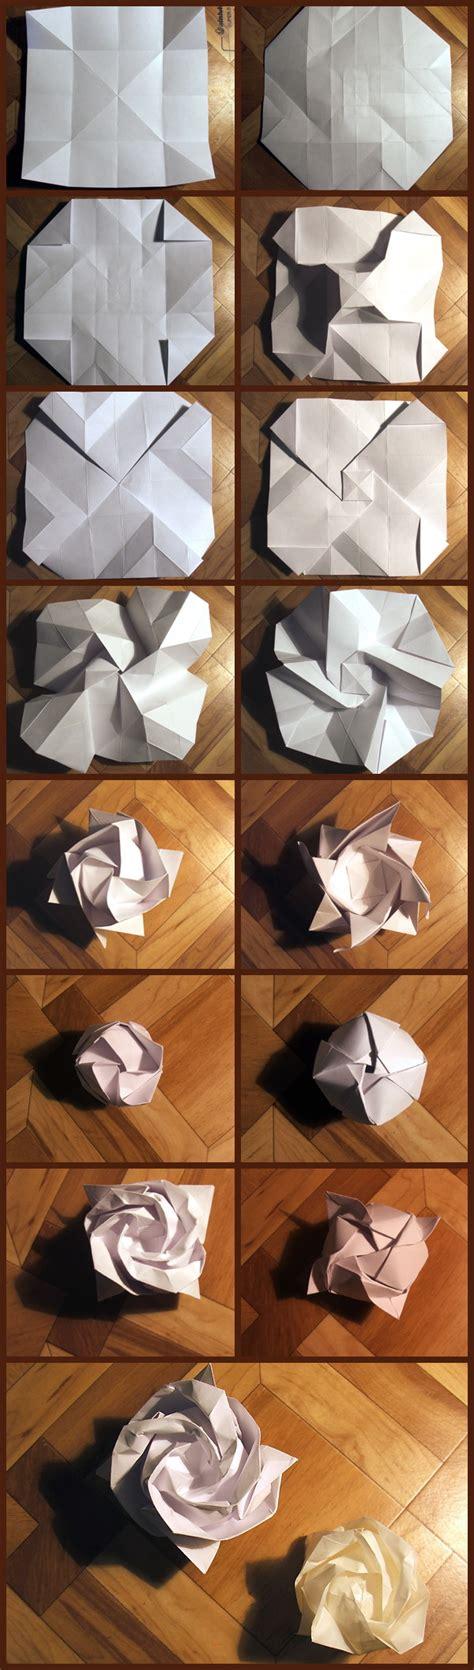 Origami Kawasaki Step By Step - origami tutorial origami